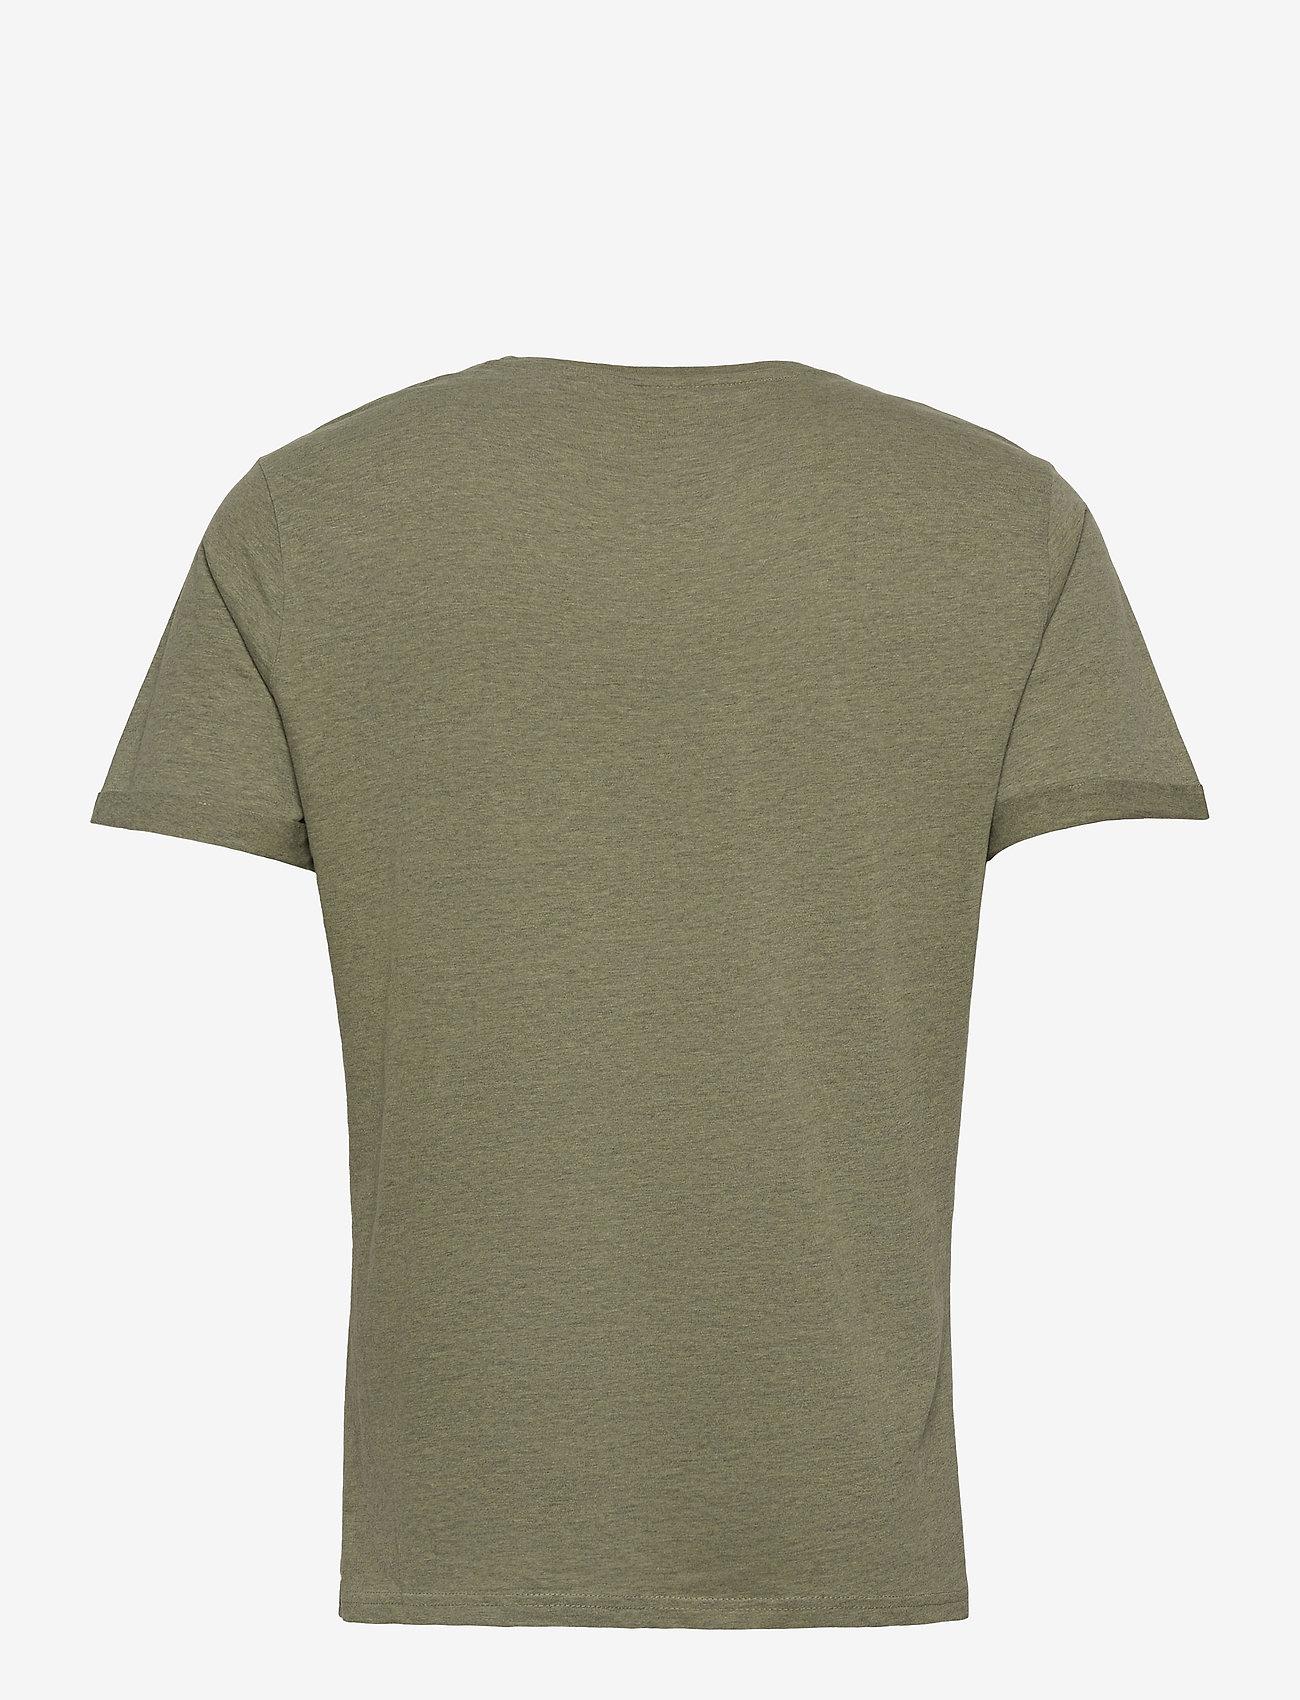 Blend - Tee - t-shirts basiques - oil green - 1